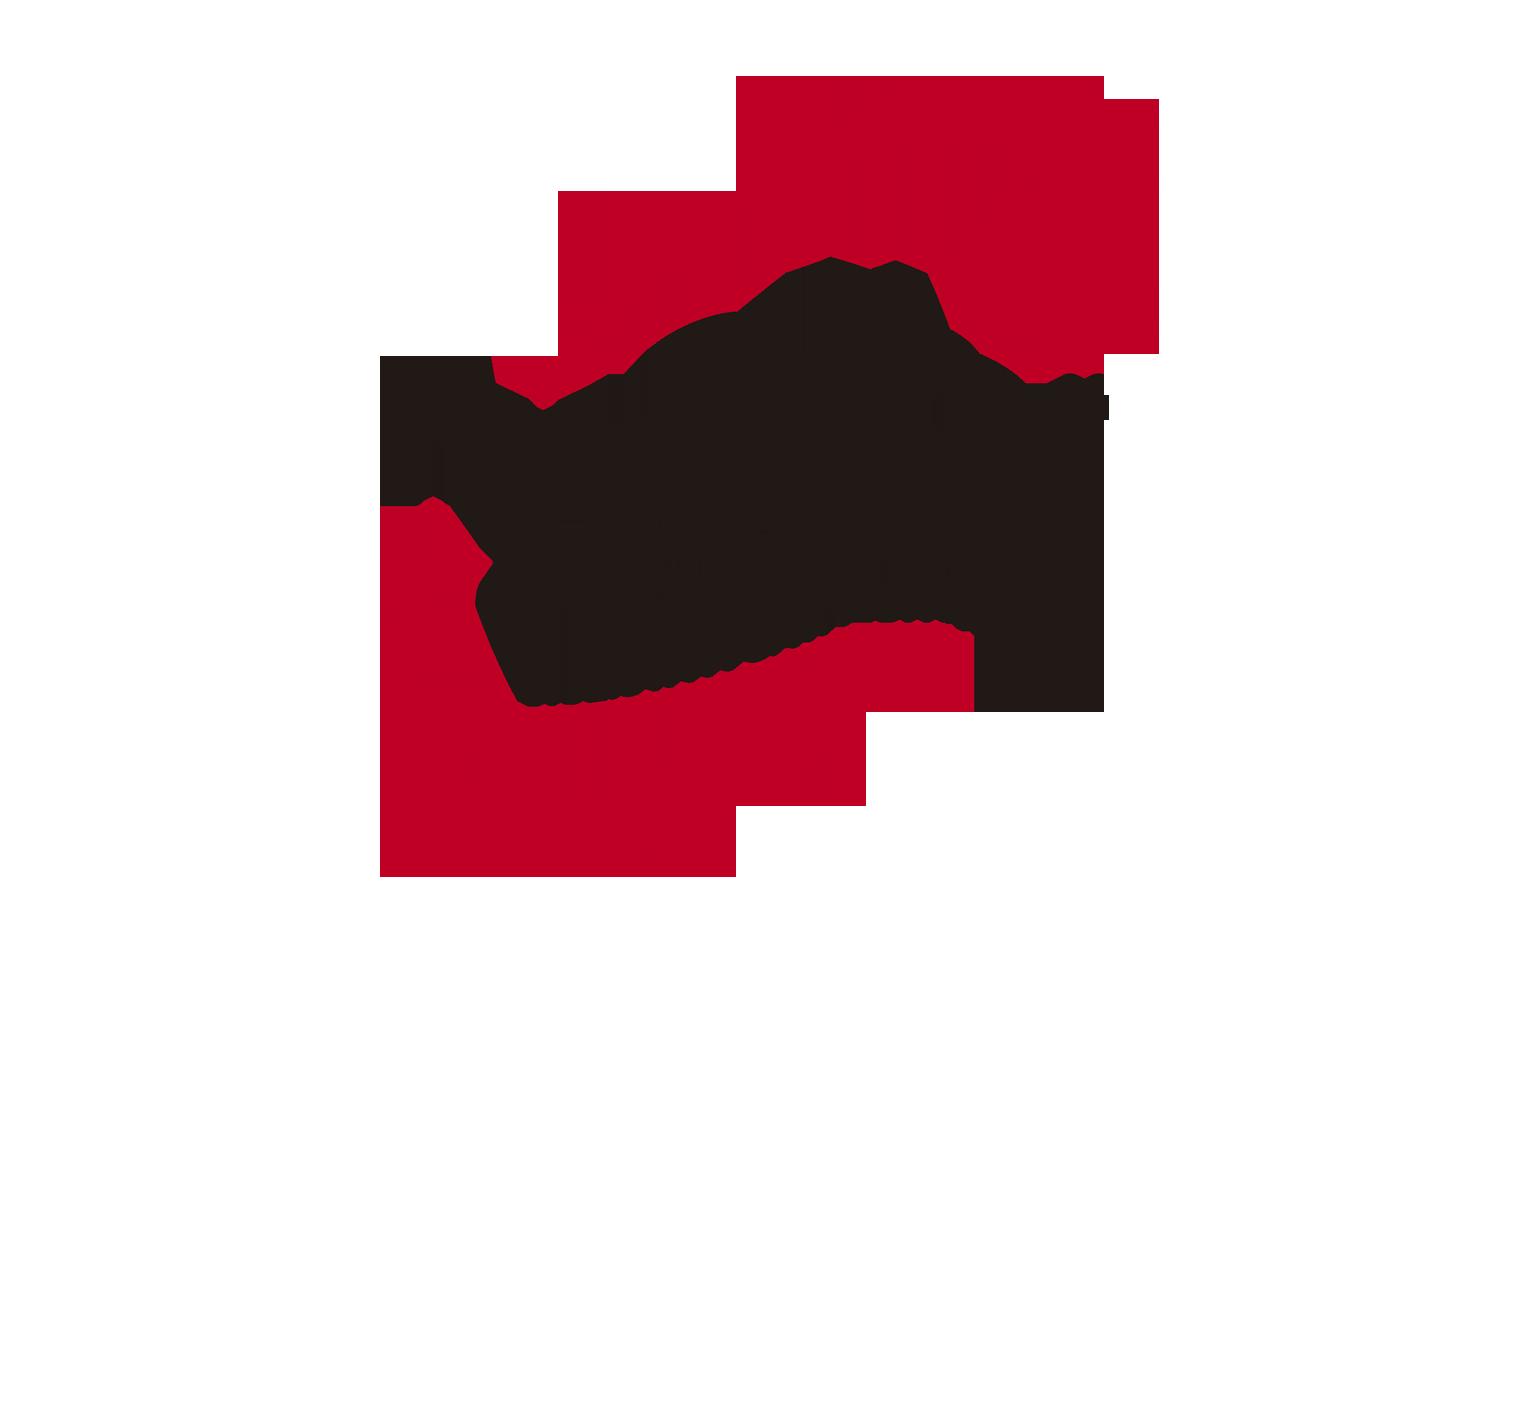 LOGO_VOLTA_OFICIAL copia